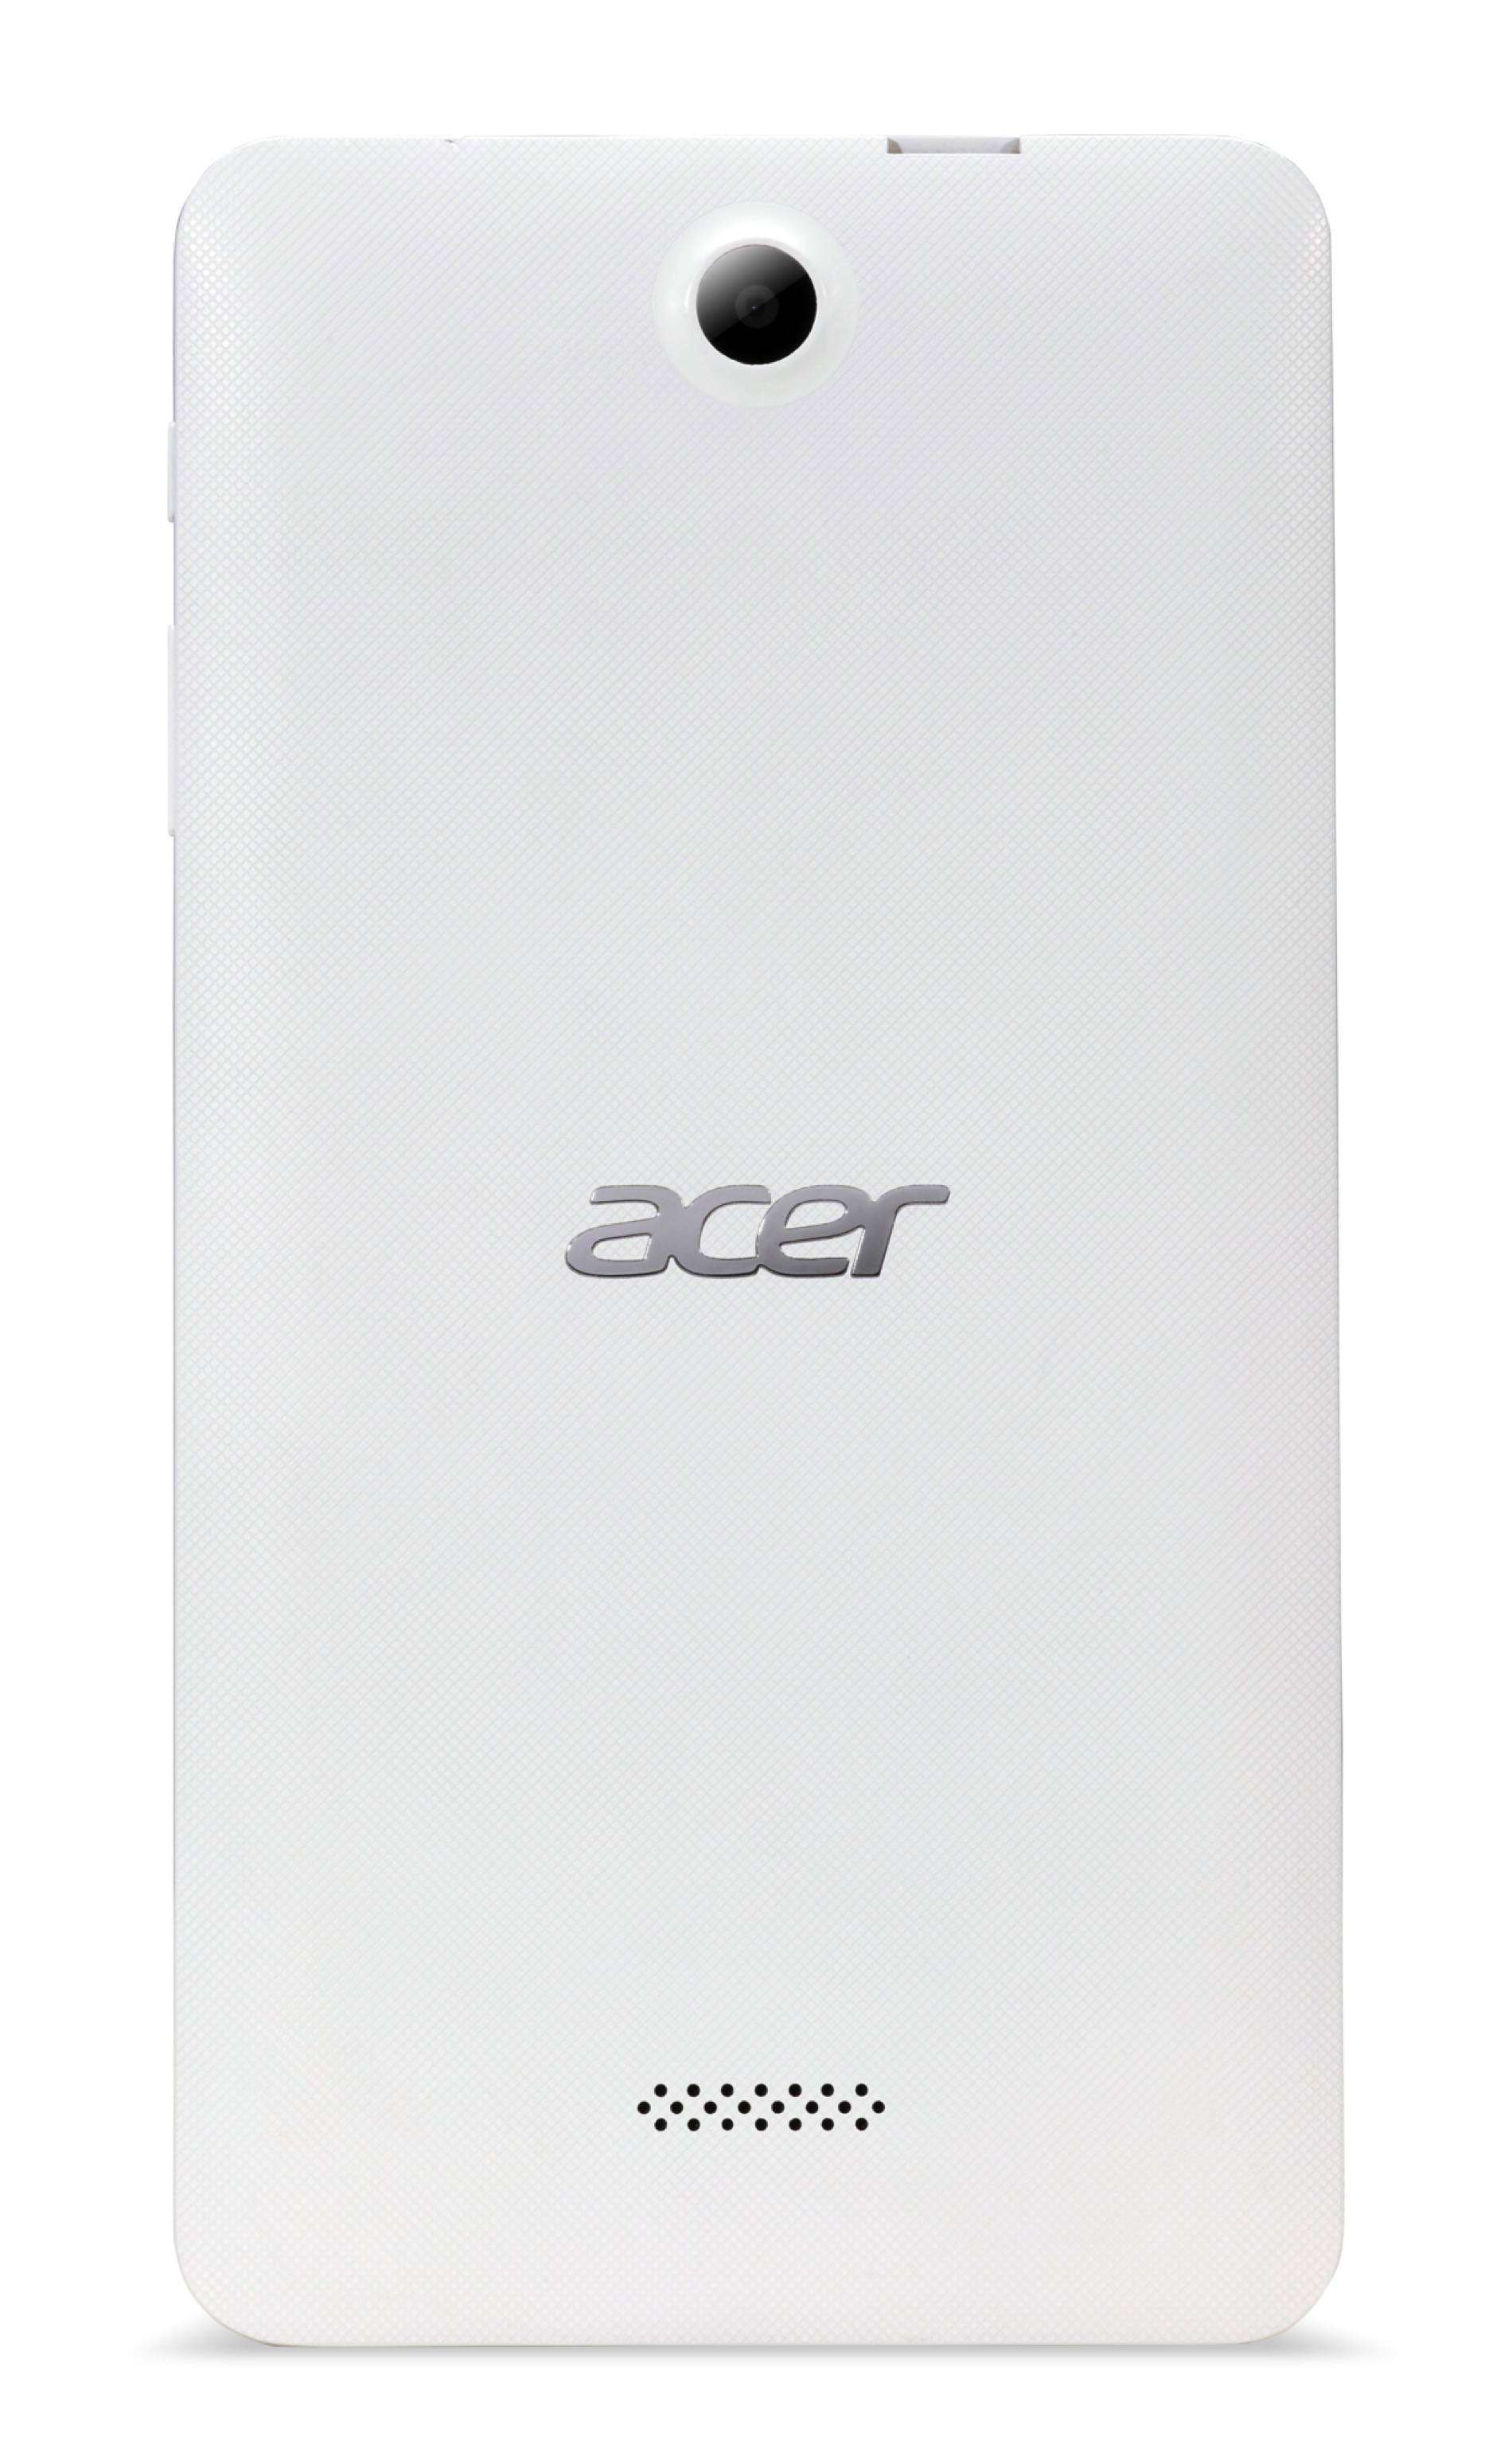 Acer Iconia 7 Kids AH Press 10